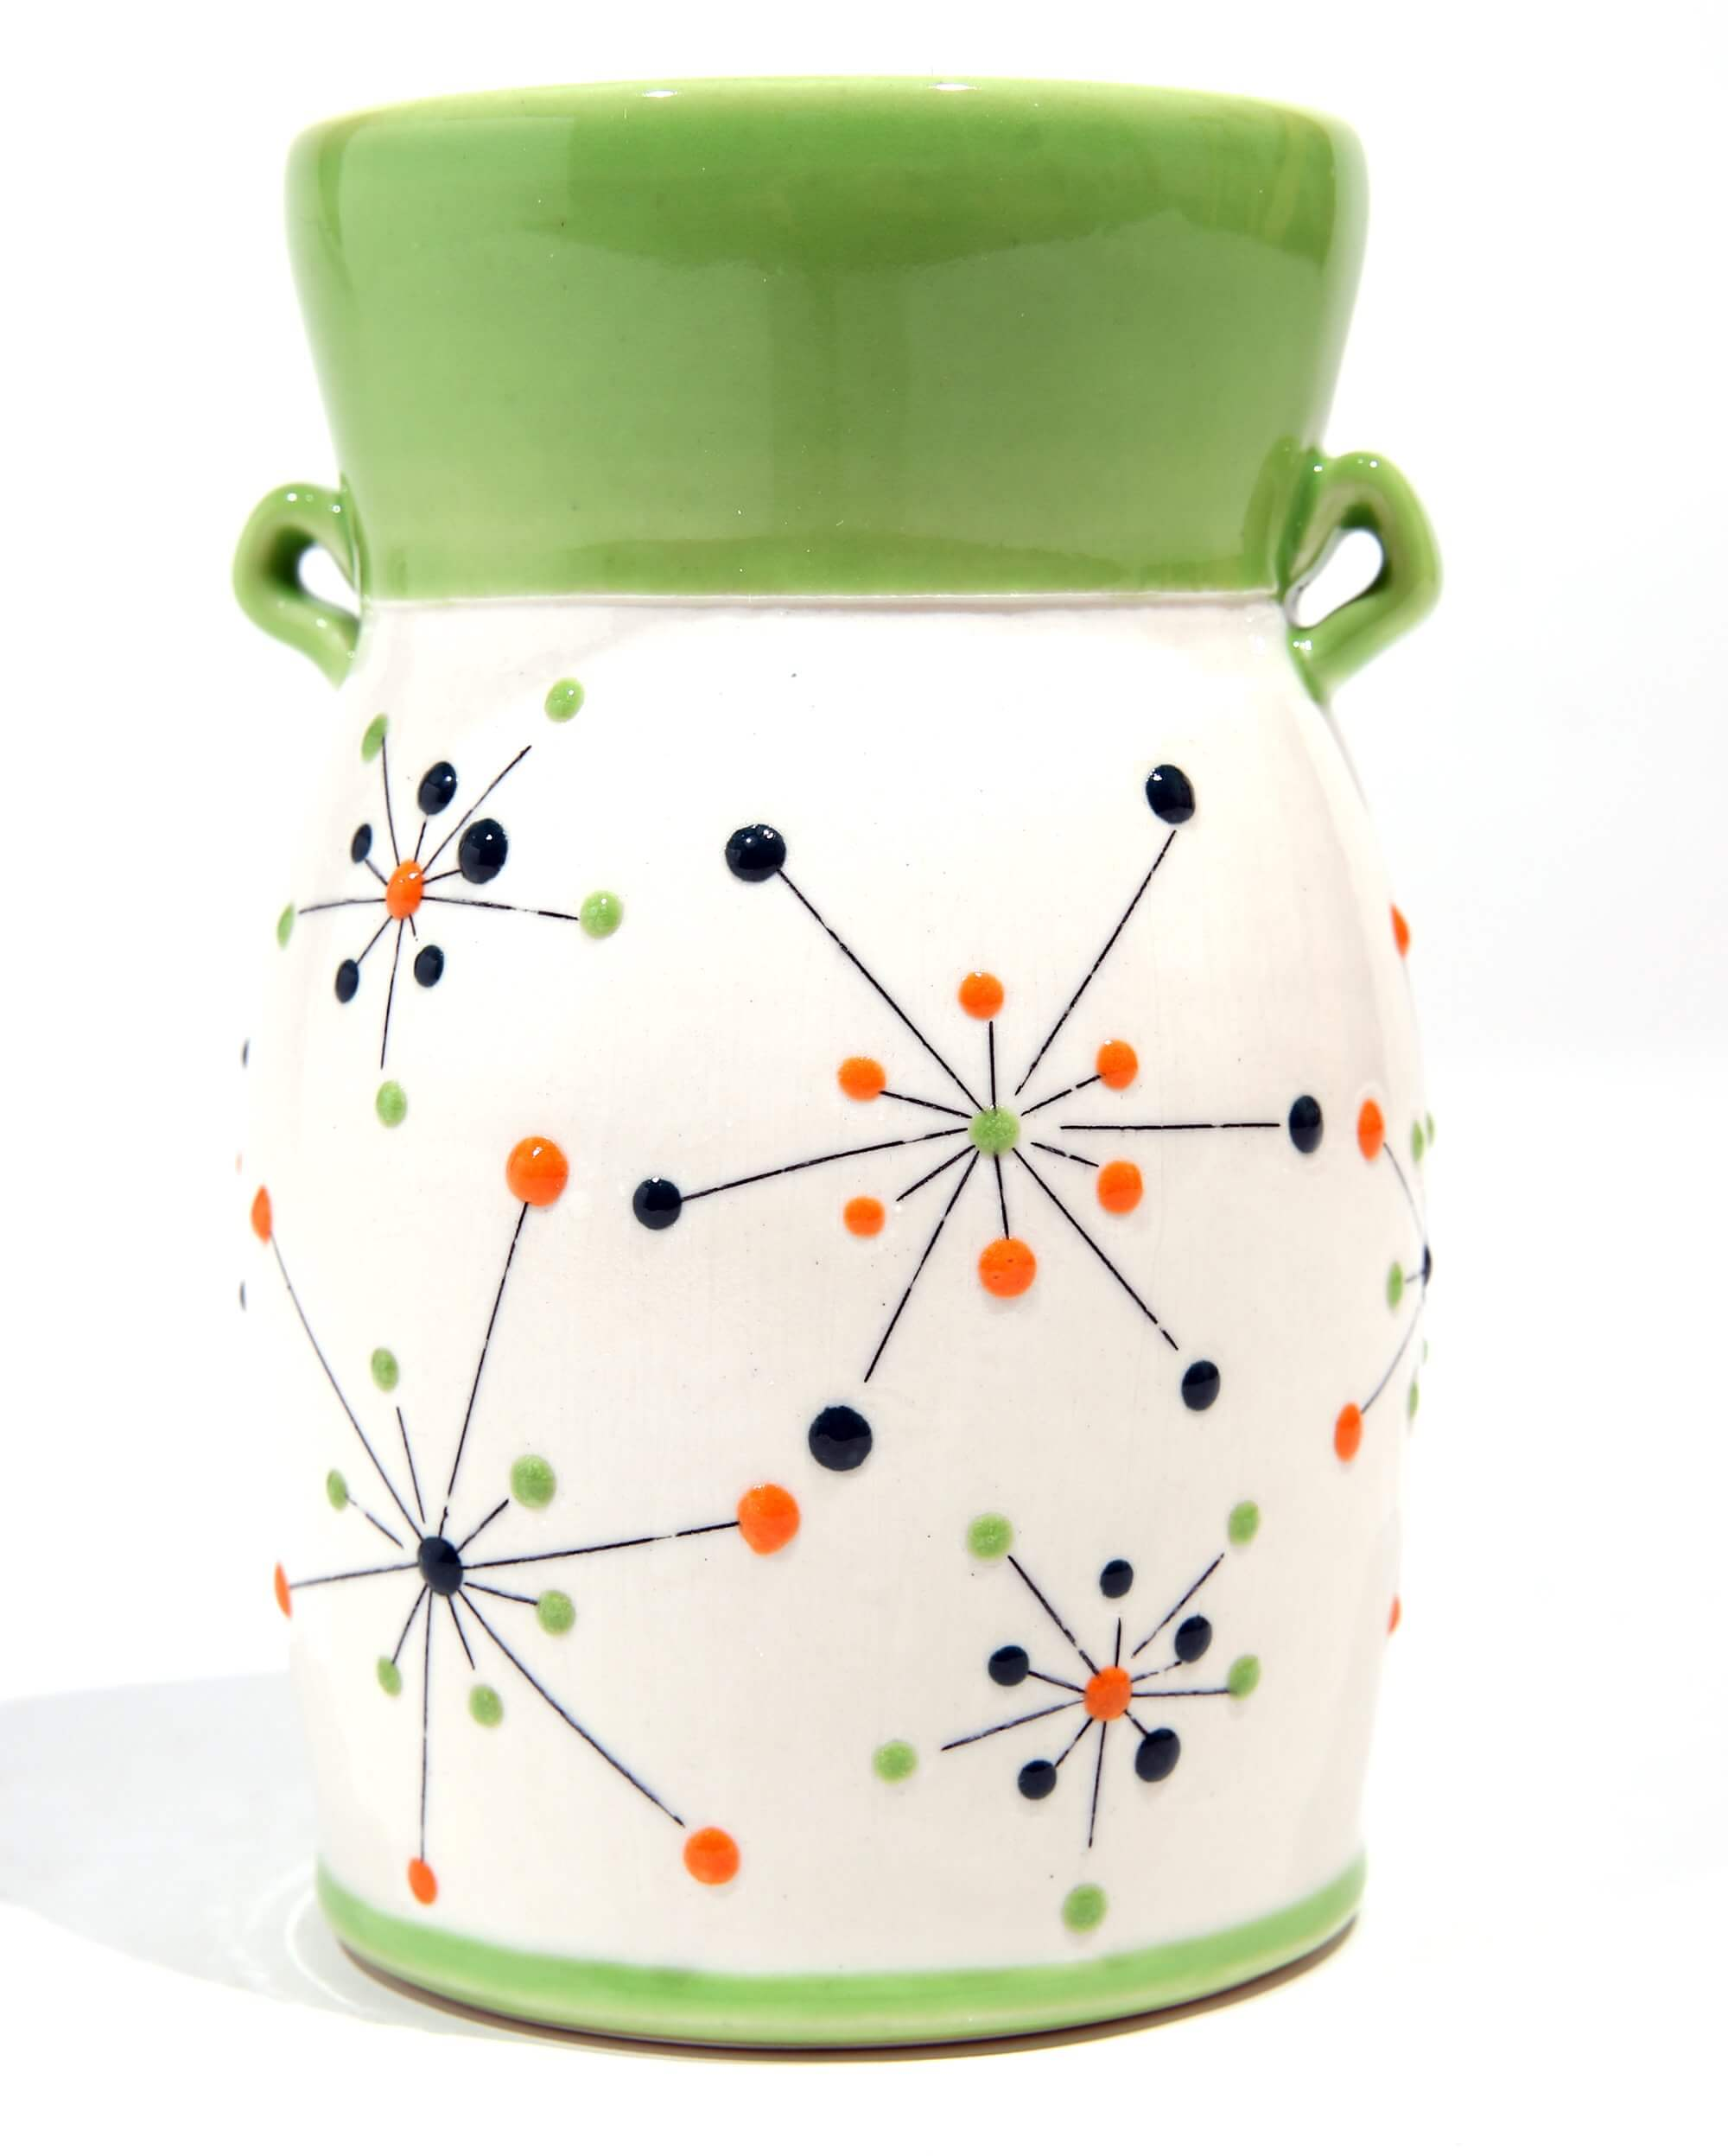 Green starburst vase